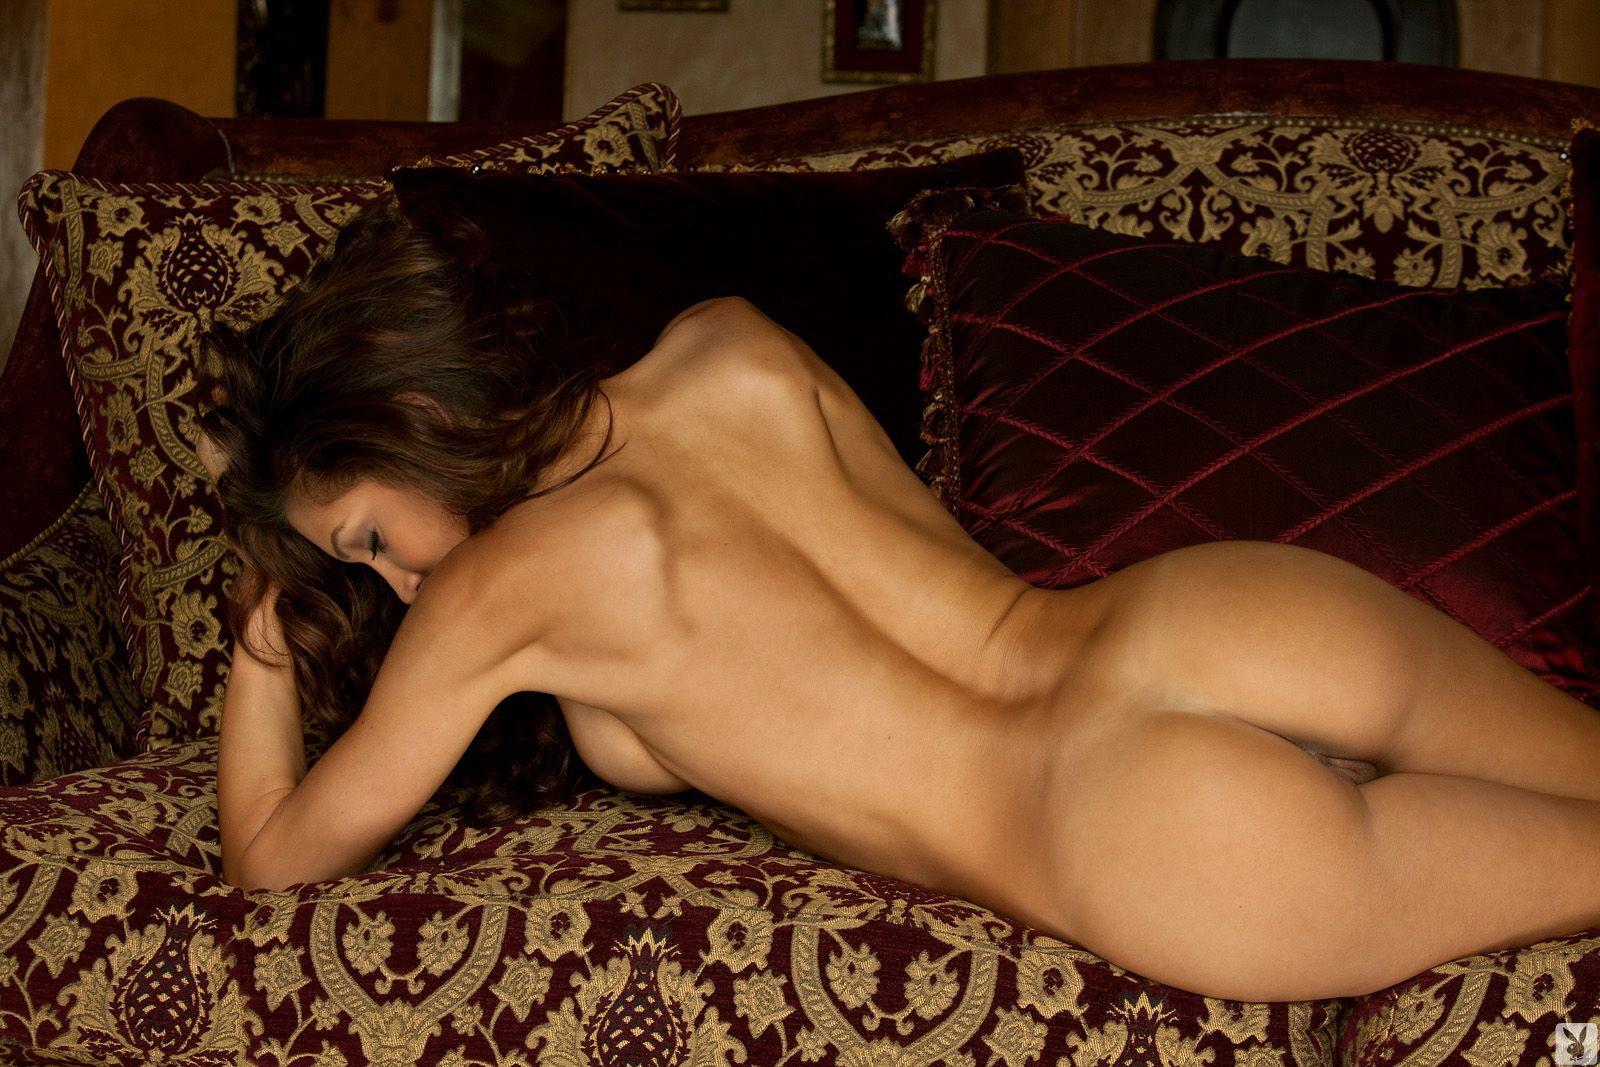 Angela martin nude